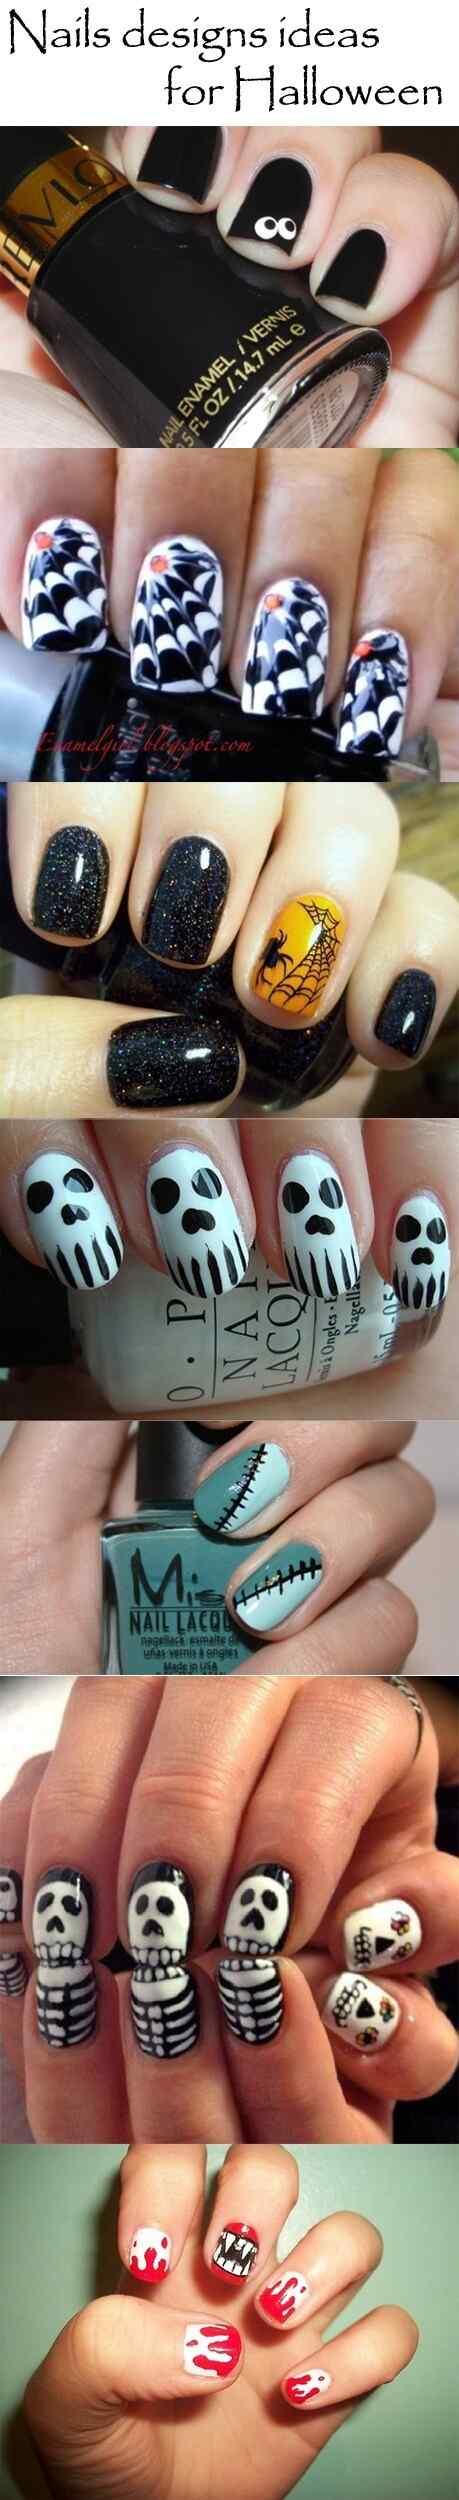 Ideas pintar unas halloween (26)